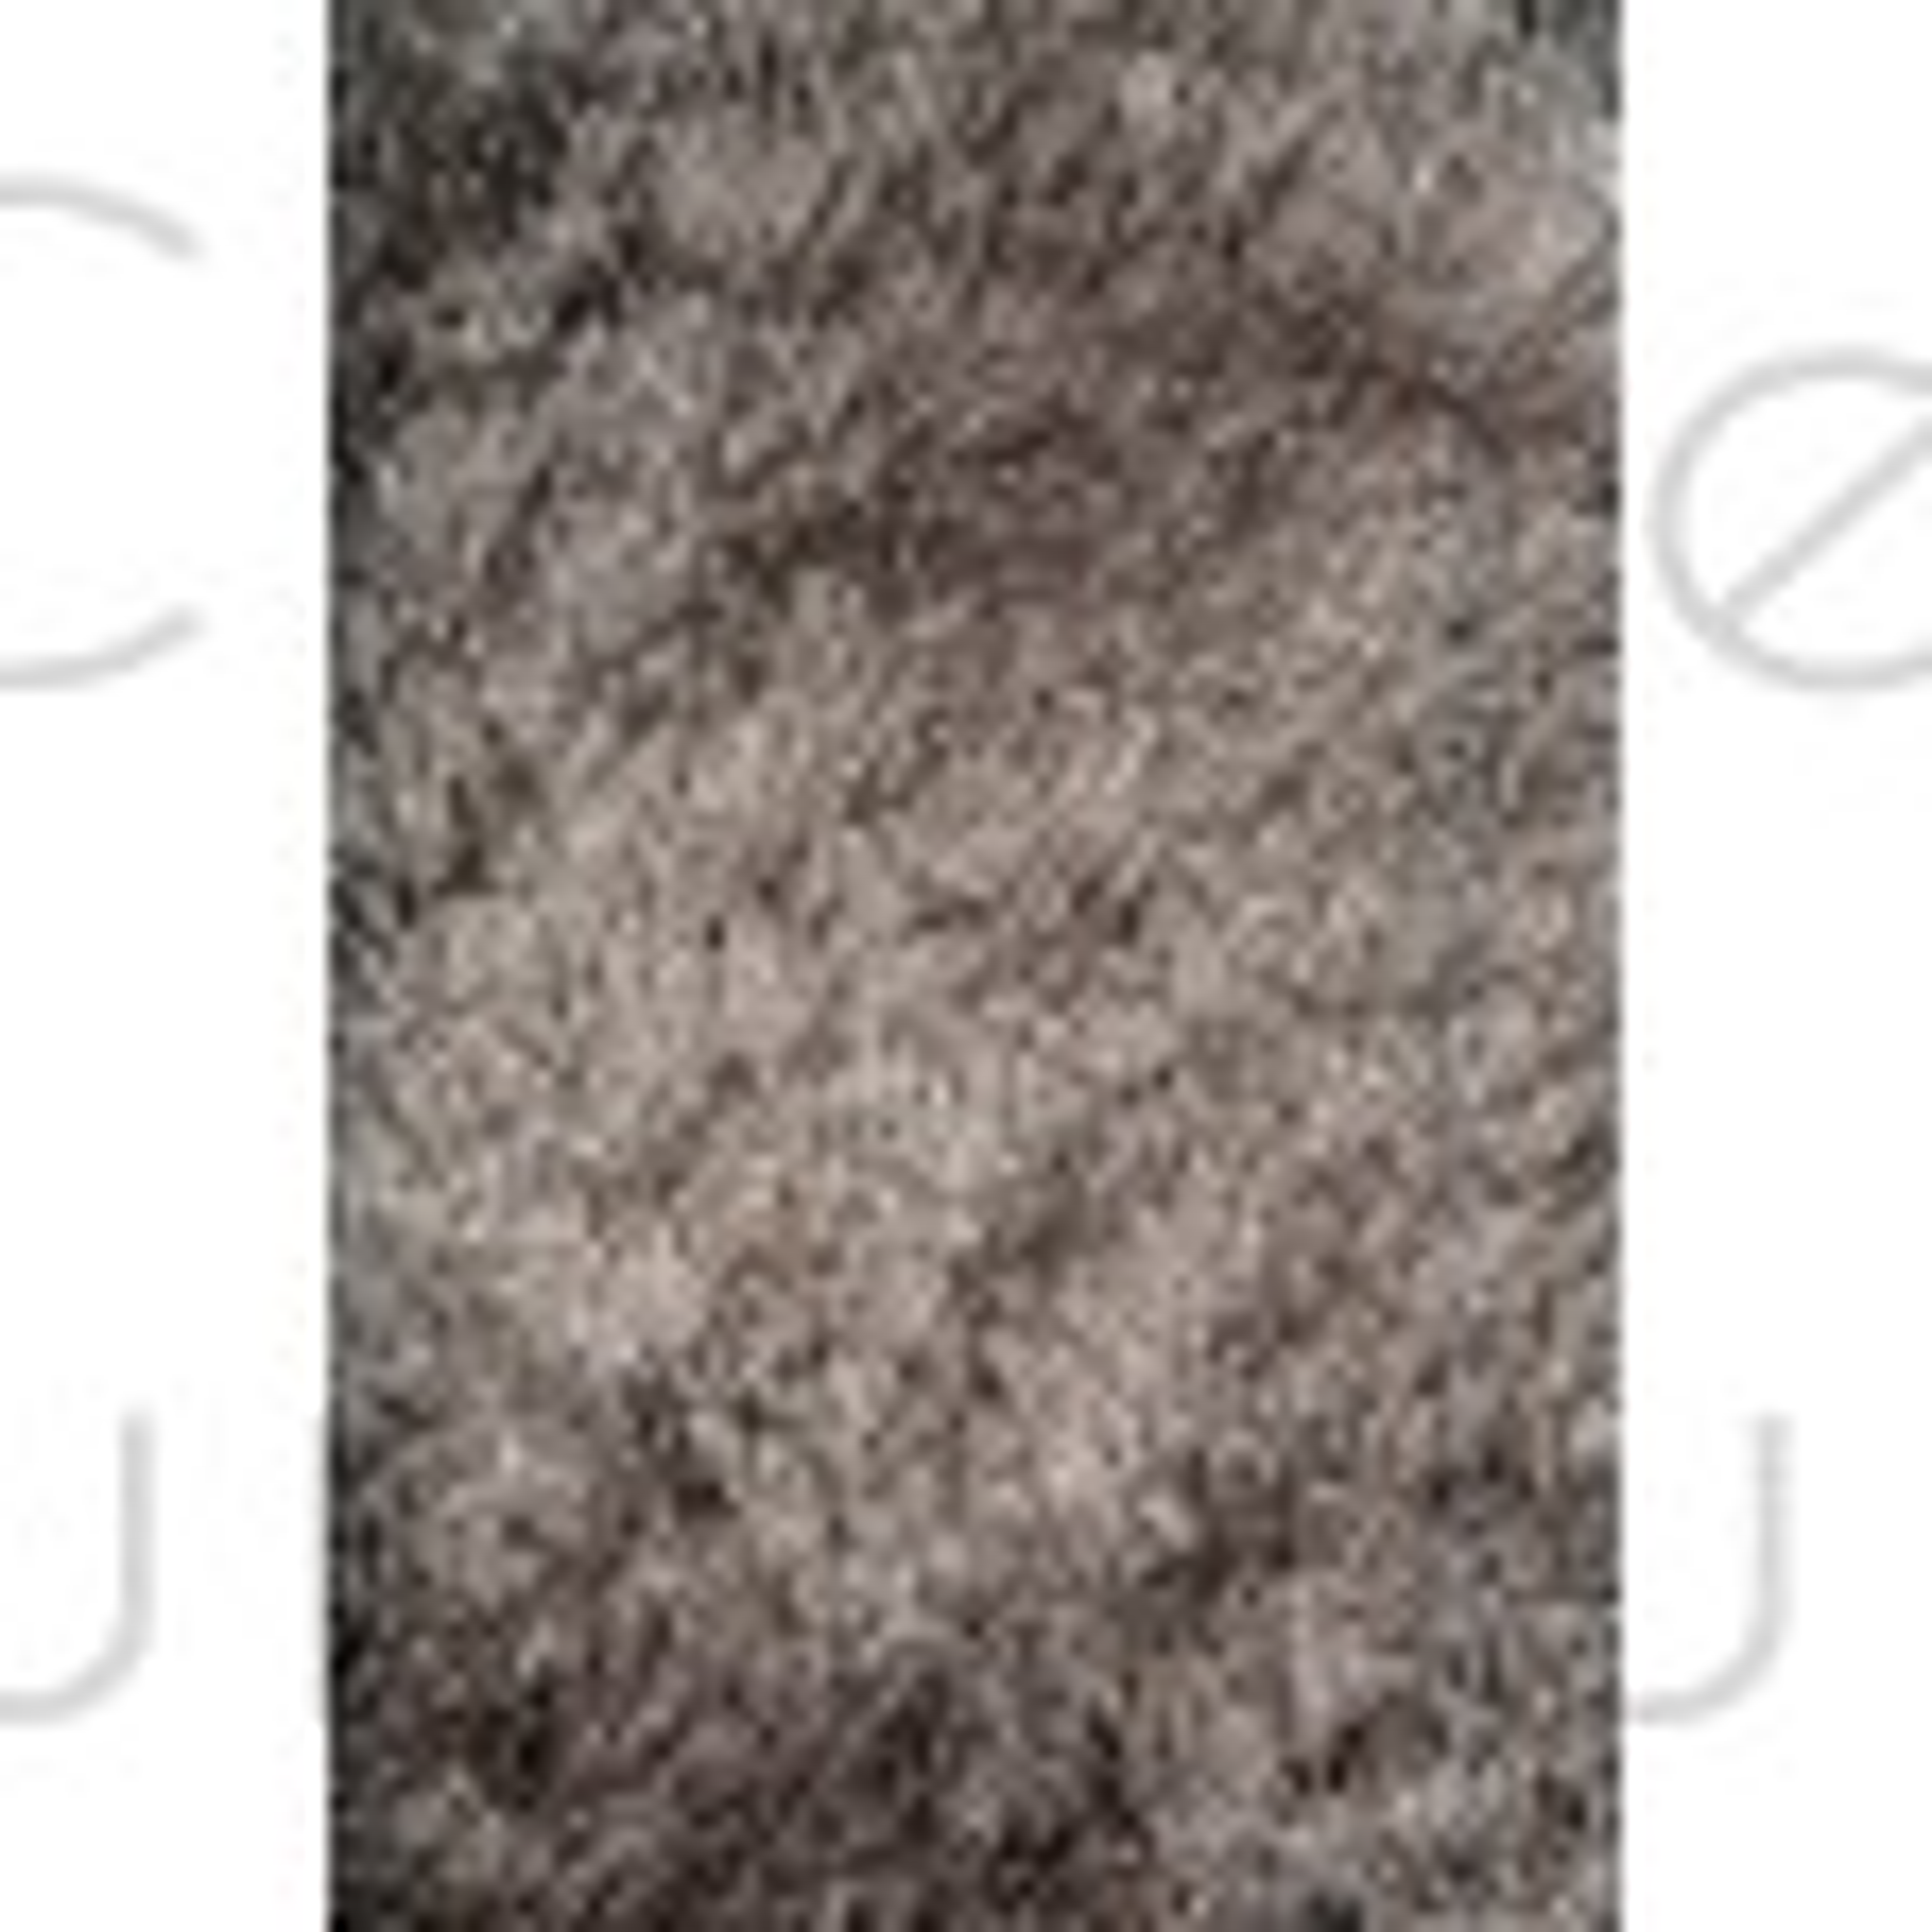 "Splendour Shadow Shaggy Rug - Silver - Size 60 x 110 cm (2' x 3'7"")"